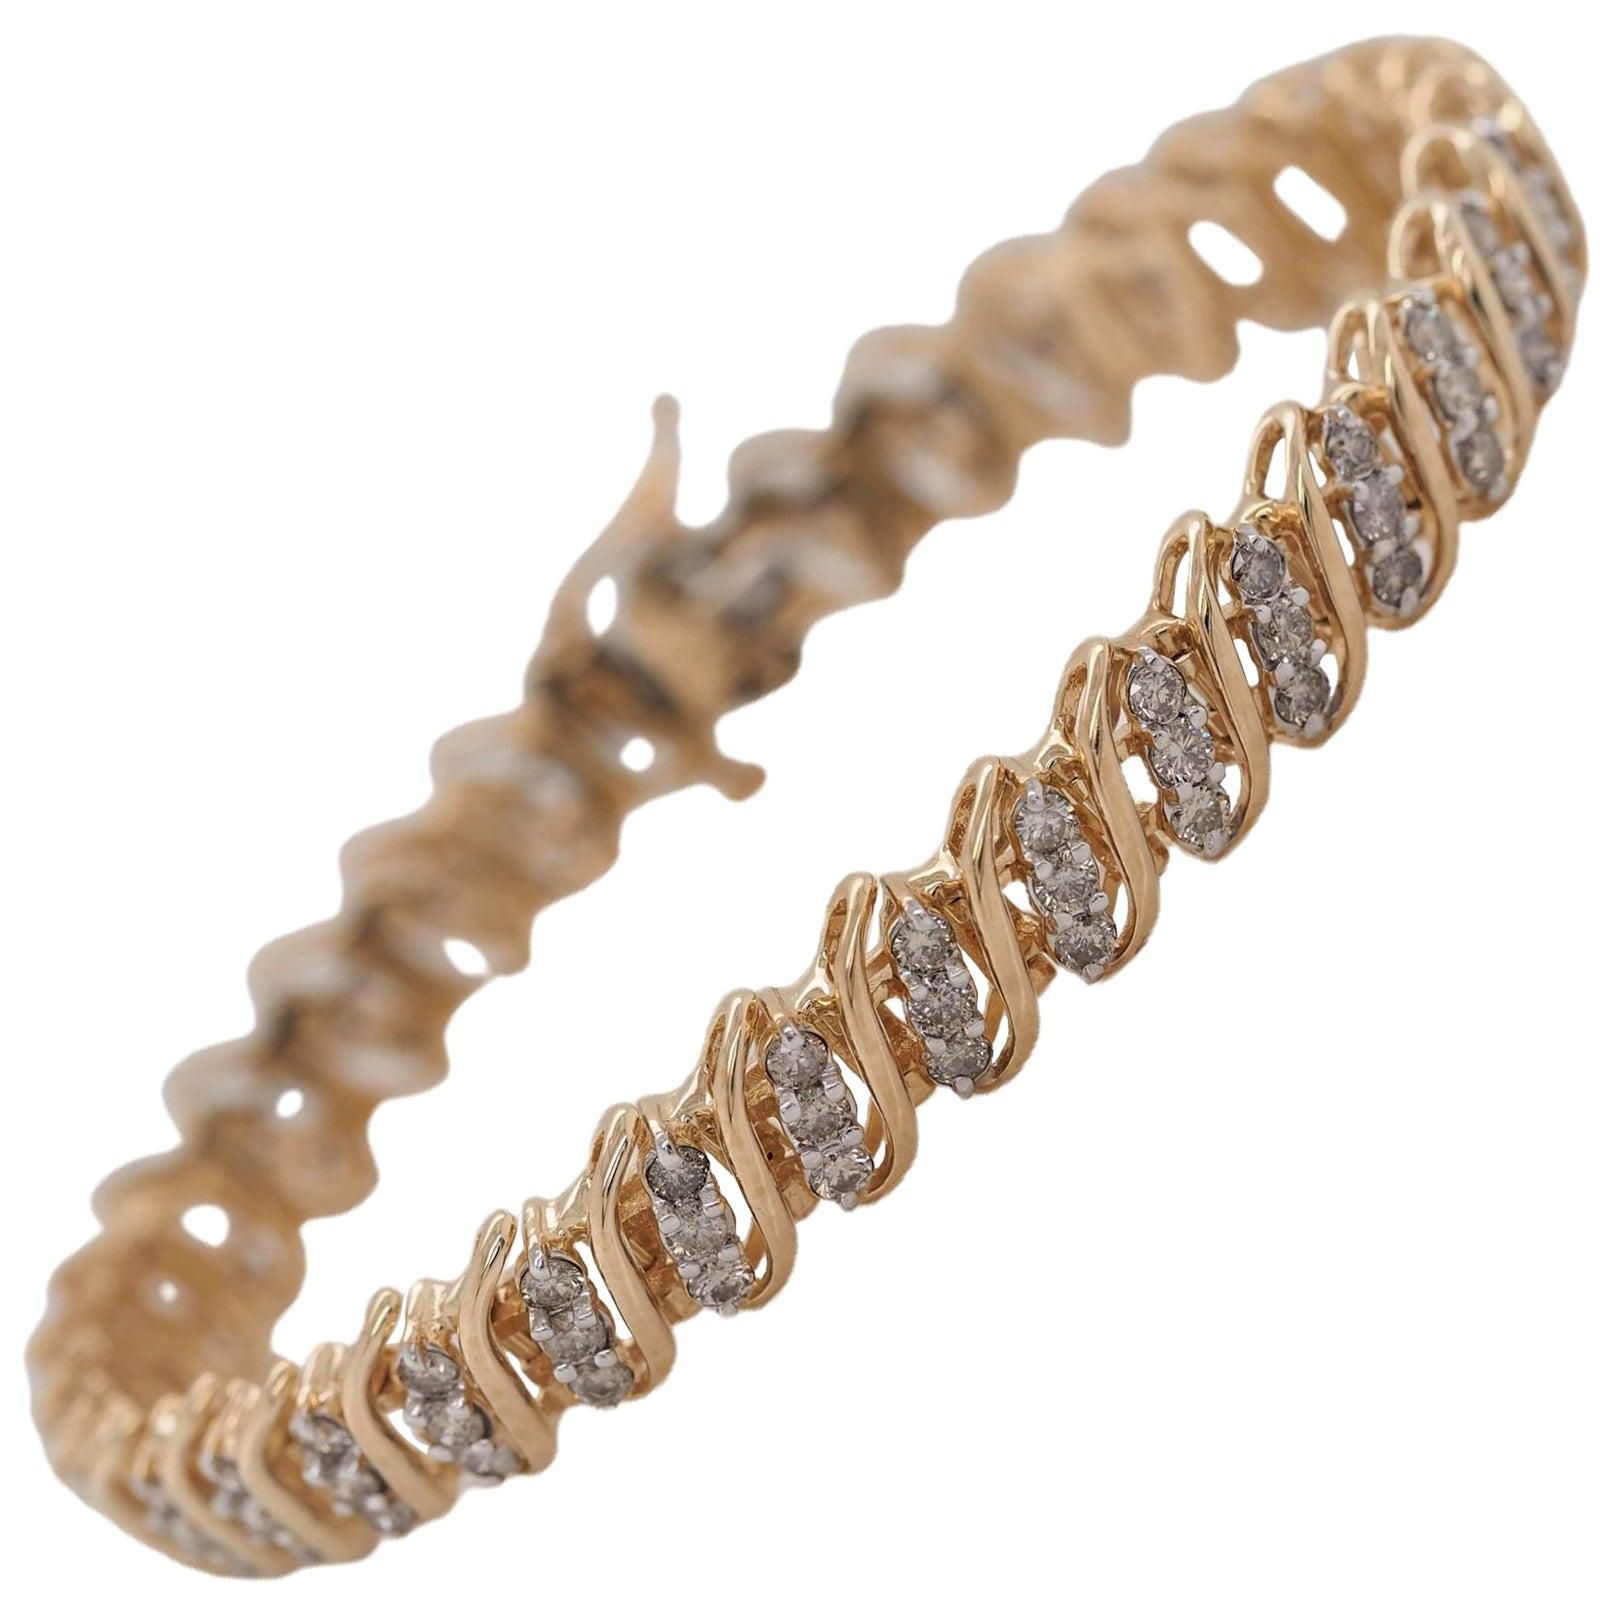 14 Karat Yellow Gold 4 Carat Round Diamond Tennis Bracelet